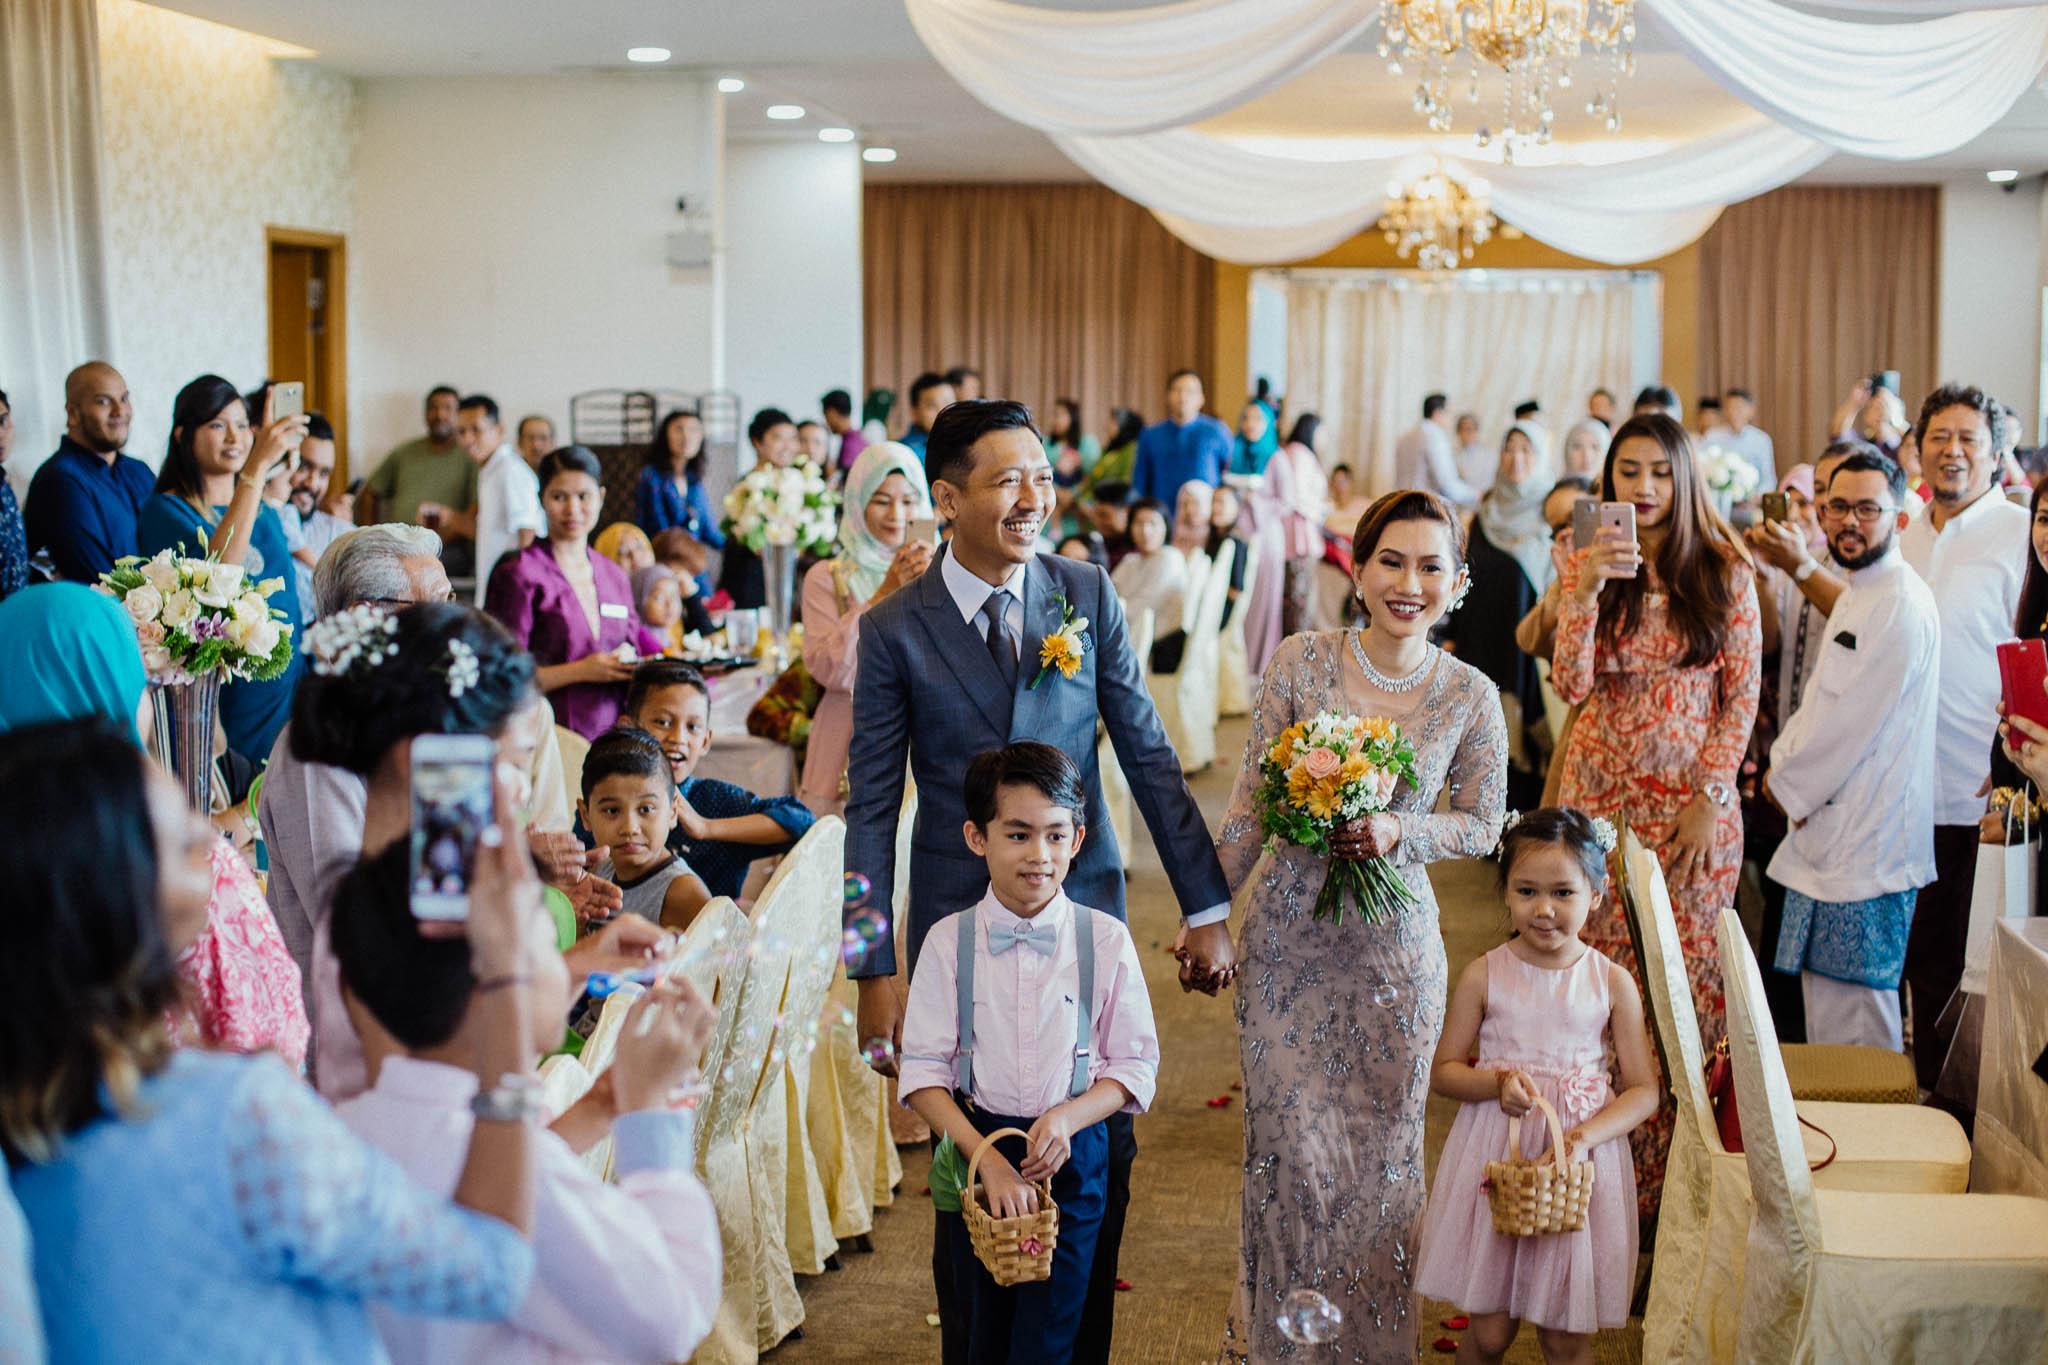 singapore-wedding-photographer-wedding-nufail-addafiq-050.jpg